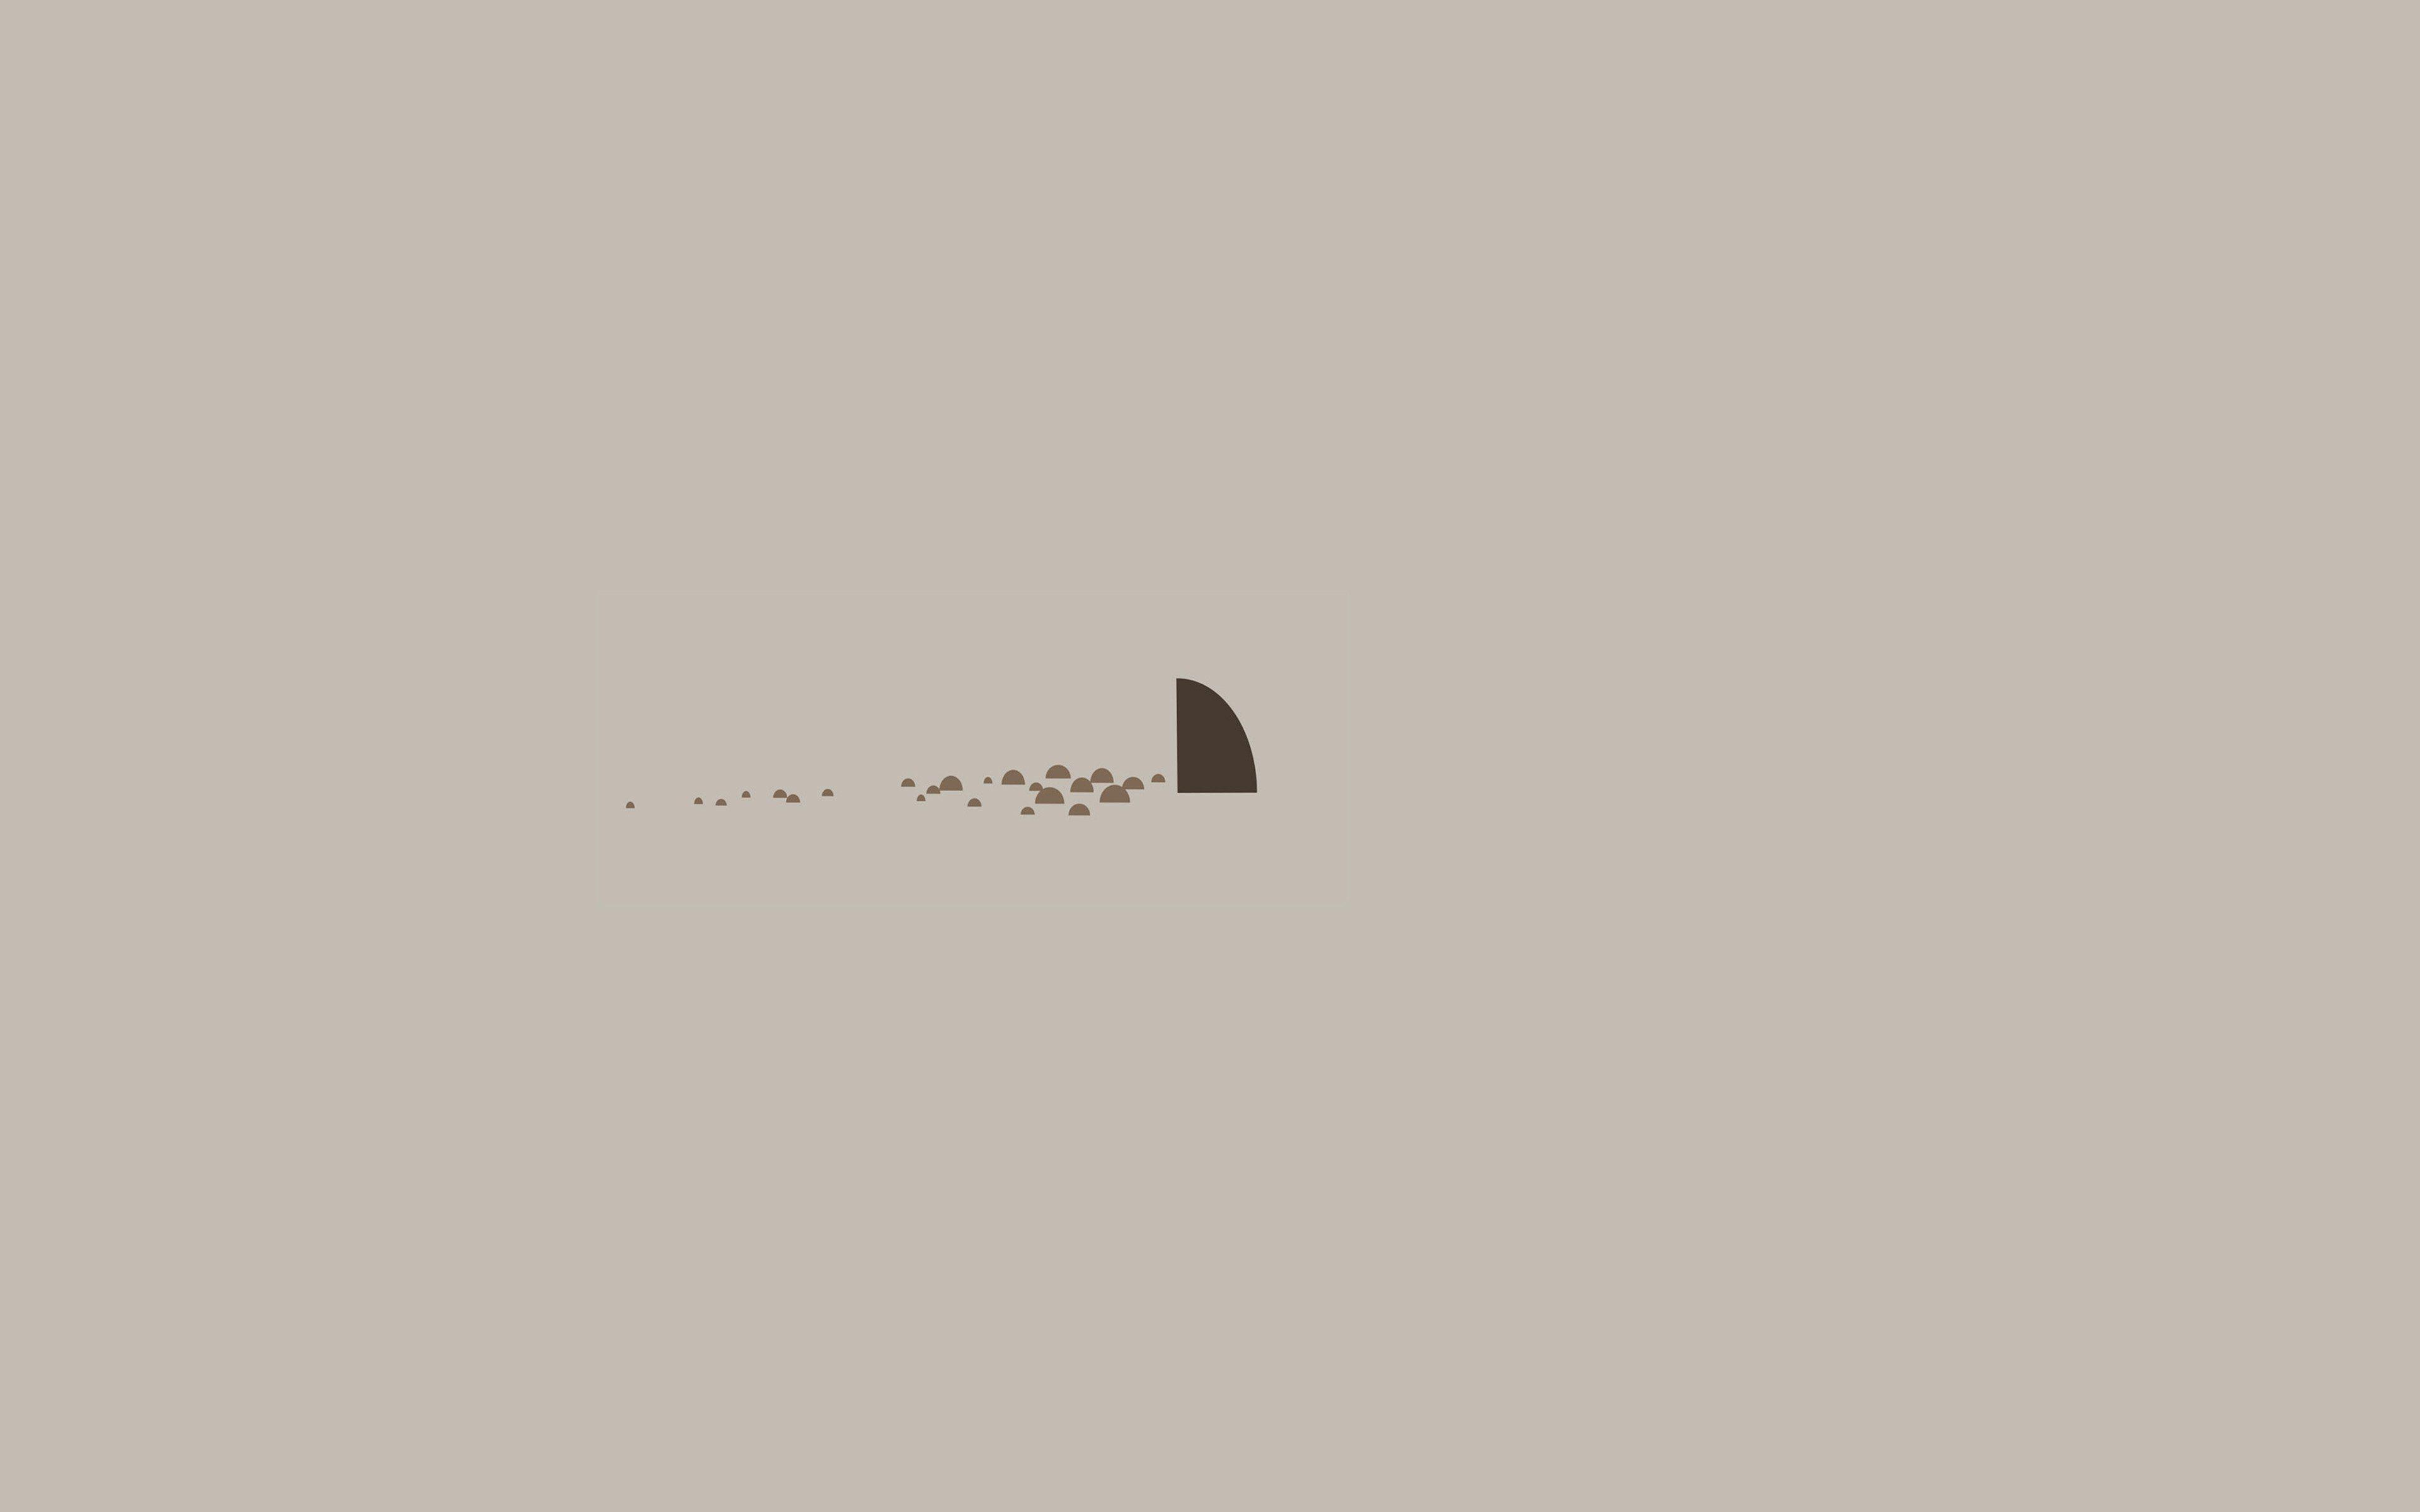 Shark Aesthetic Laptop Wallpapers   Top Shark Aesthetic 3840x2400